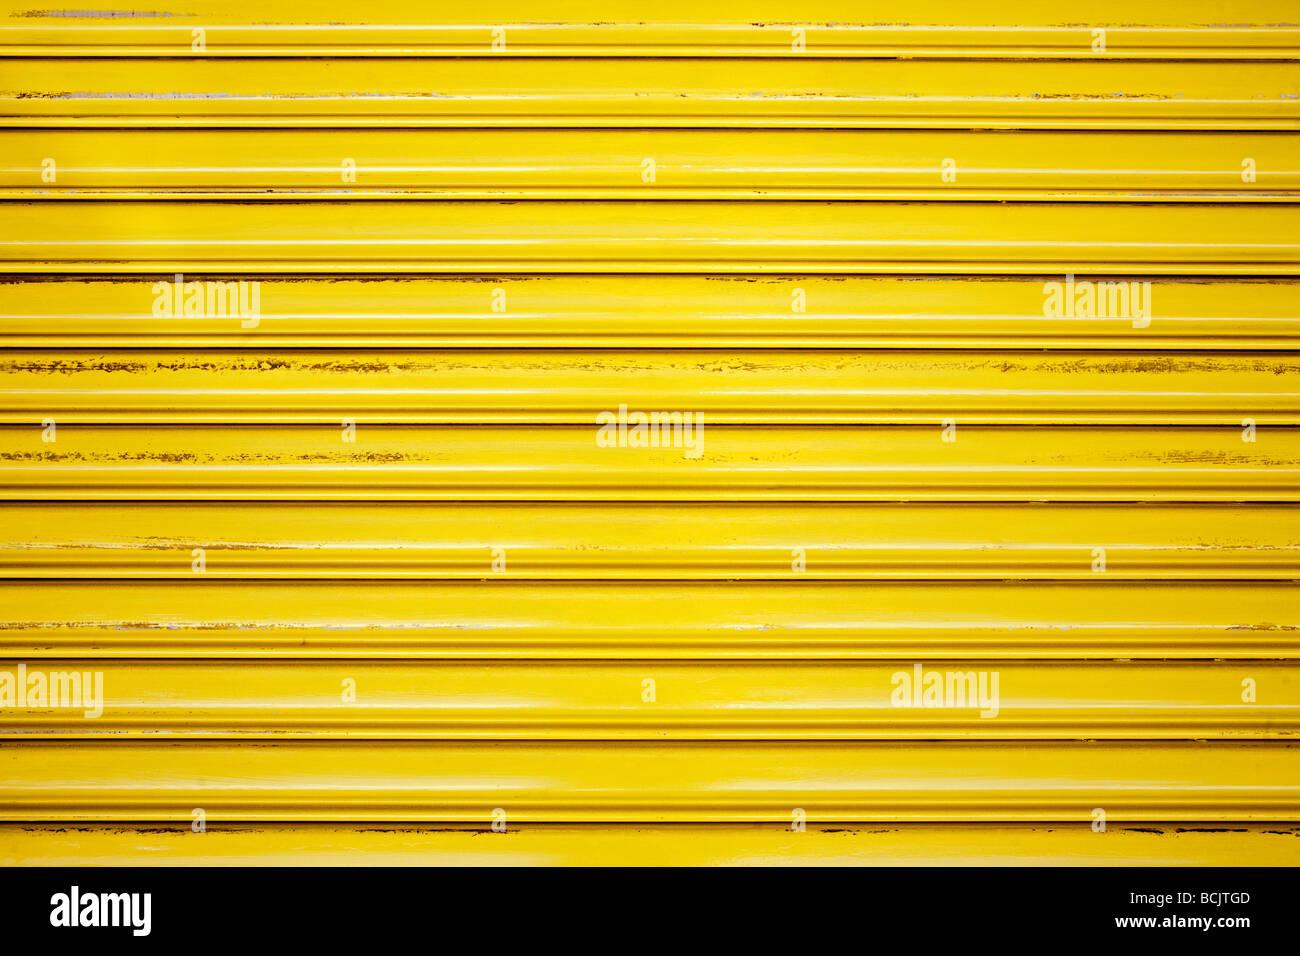 Closed yellow shutter - Stock Image